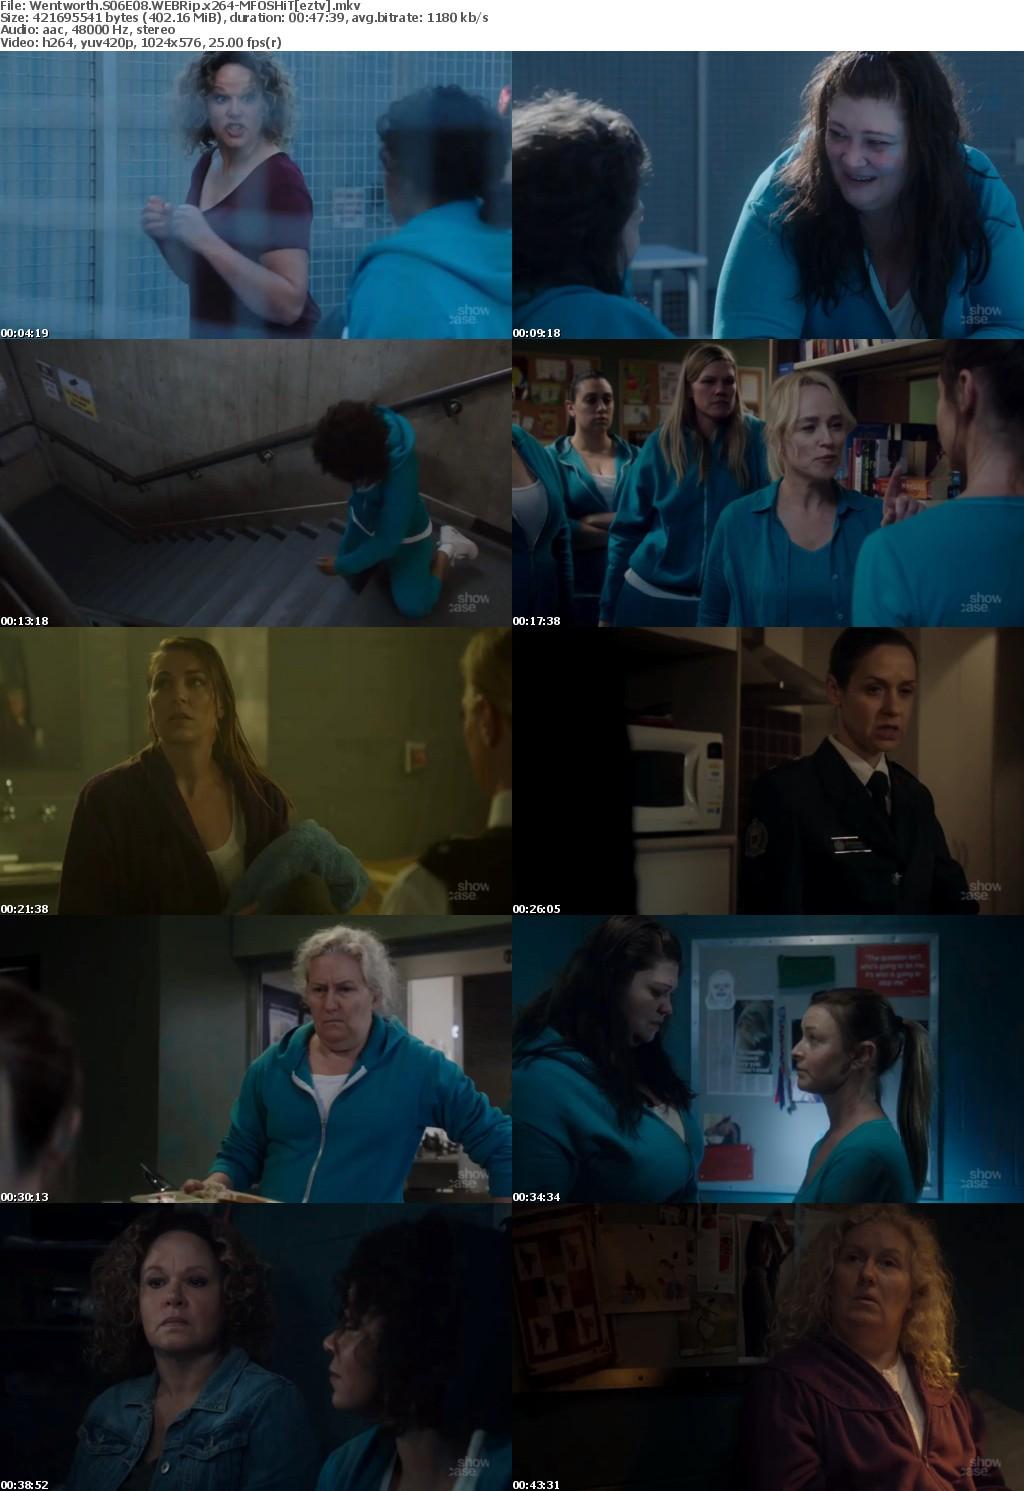 Wentworth S06E08 WEBRip x264-MFOSHiT